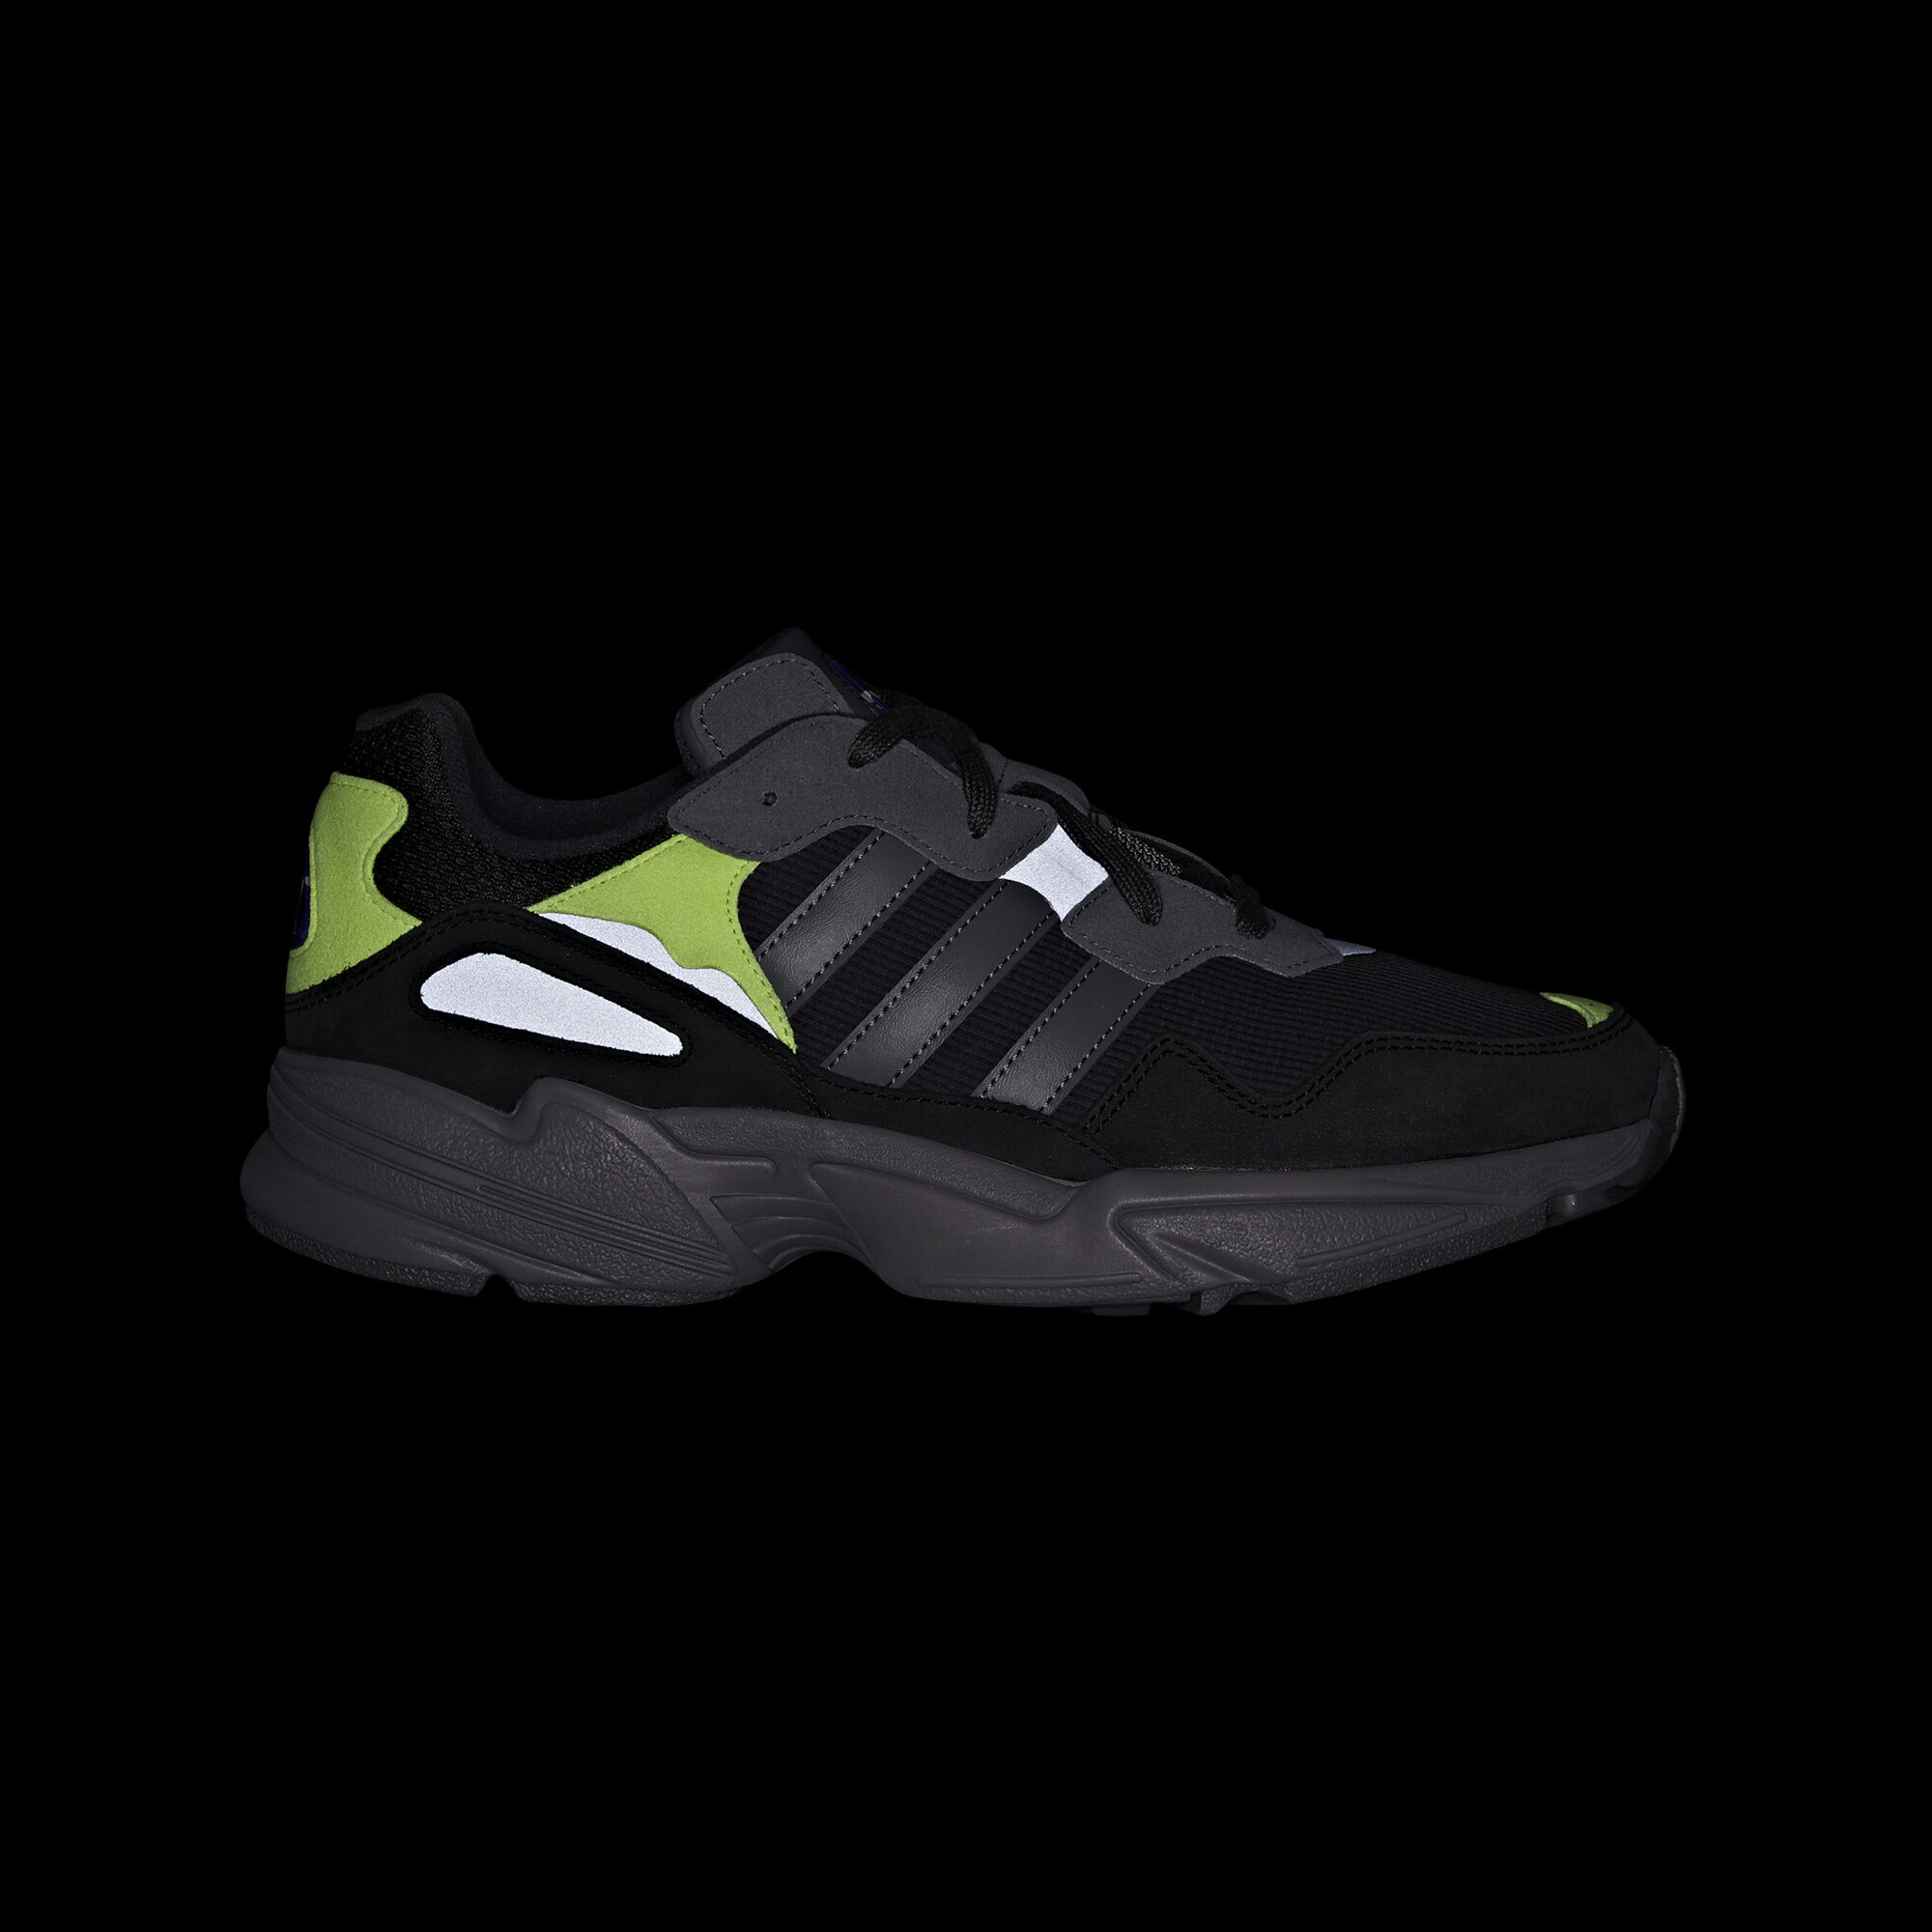 timeless design 9d2d8 cbcb6 adidas Yung-96 Shoes - schwarz  adidas Switzerland